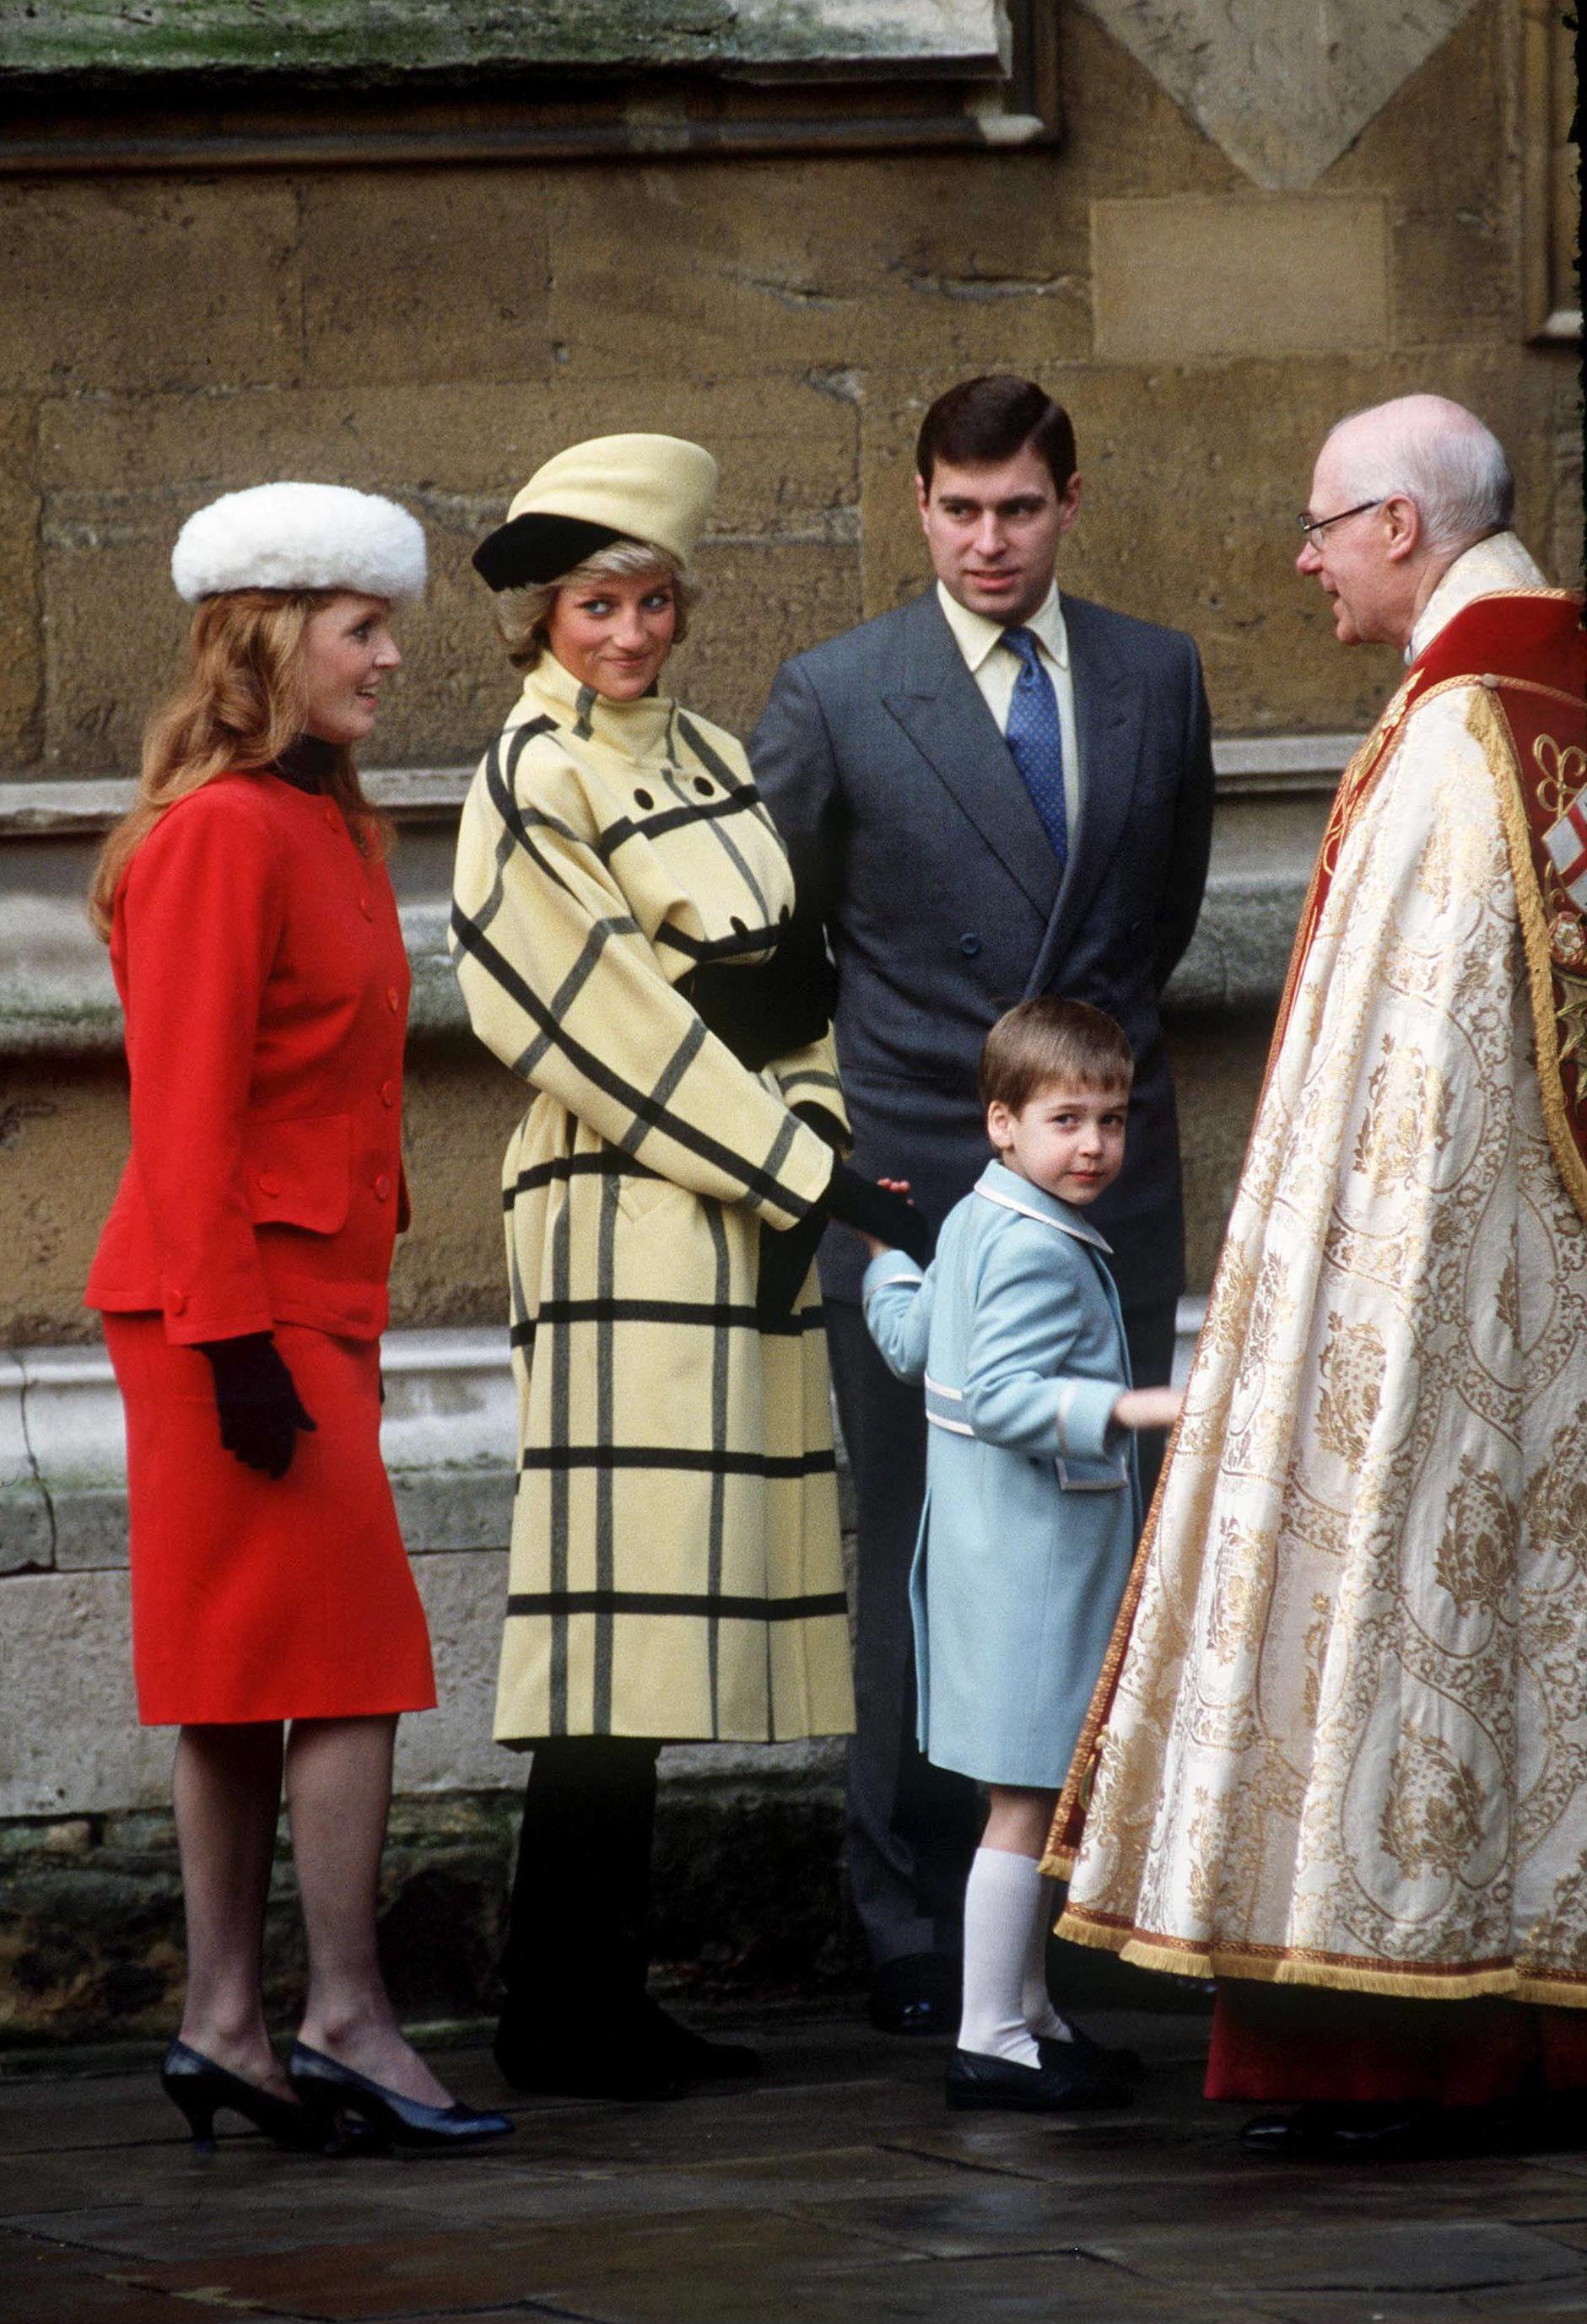 Foto Natale Famiglia Reale Inglese 1990.Royal Family Le 18 Foto Natalizie Piu Belle Della Royal Family